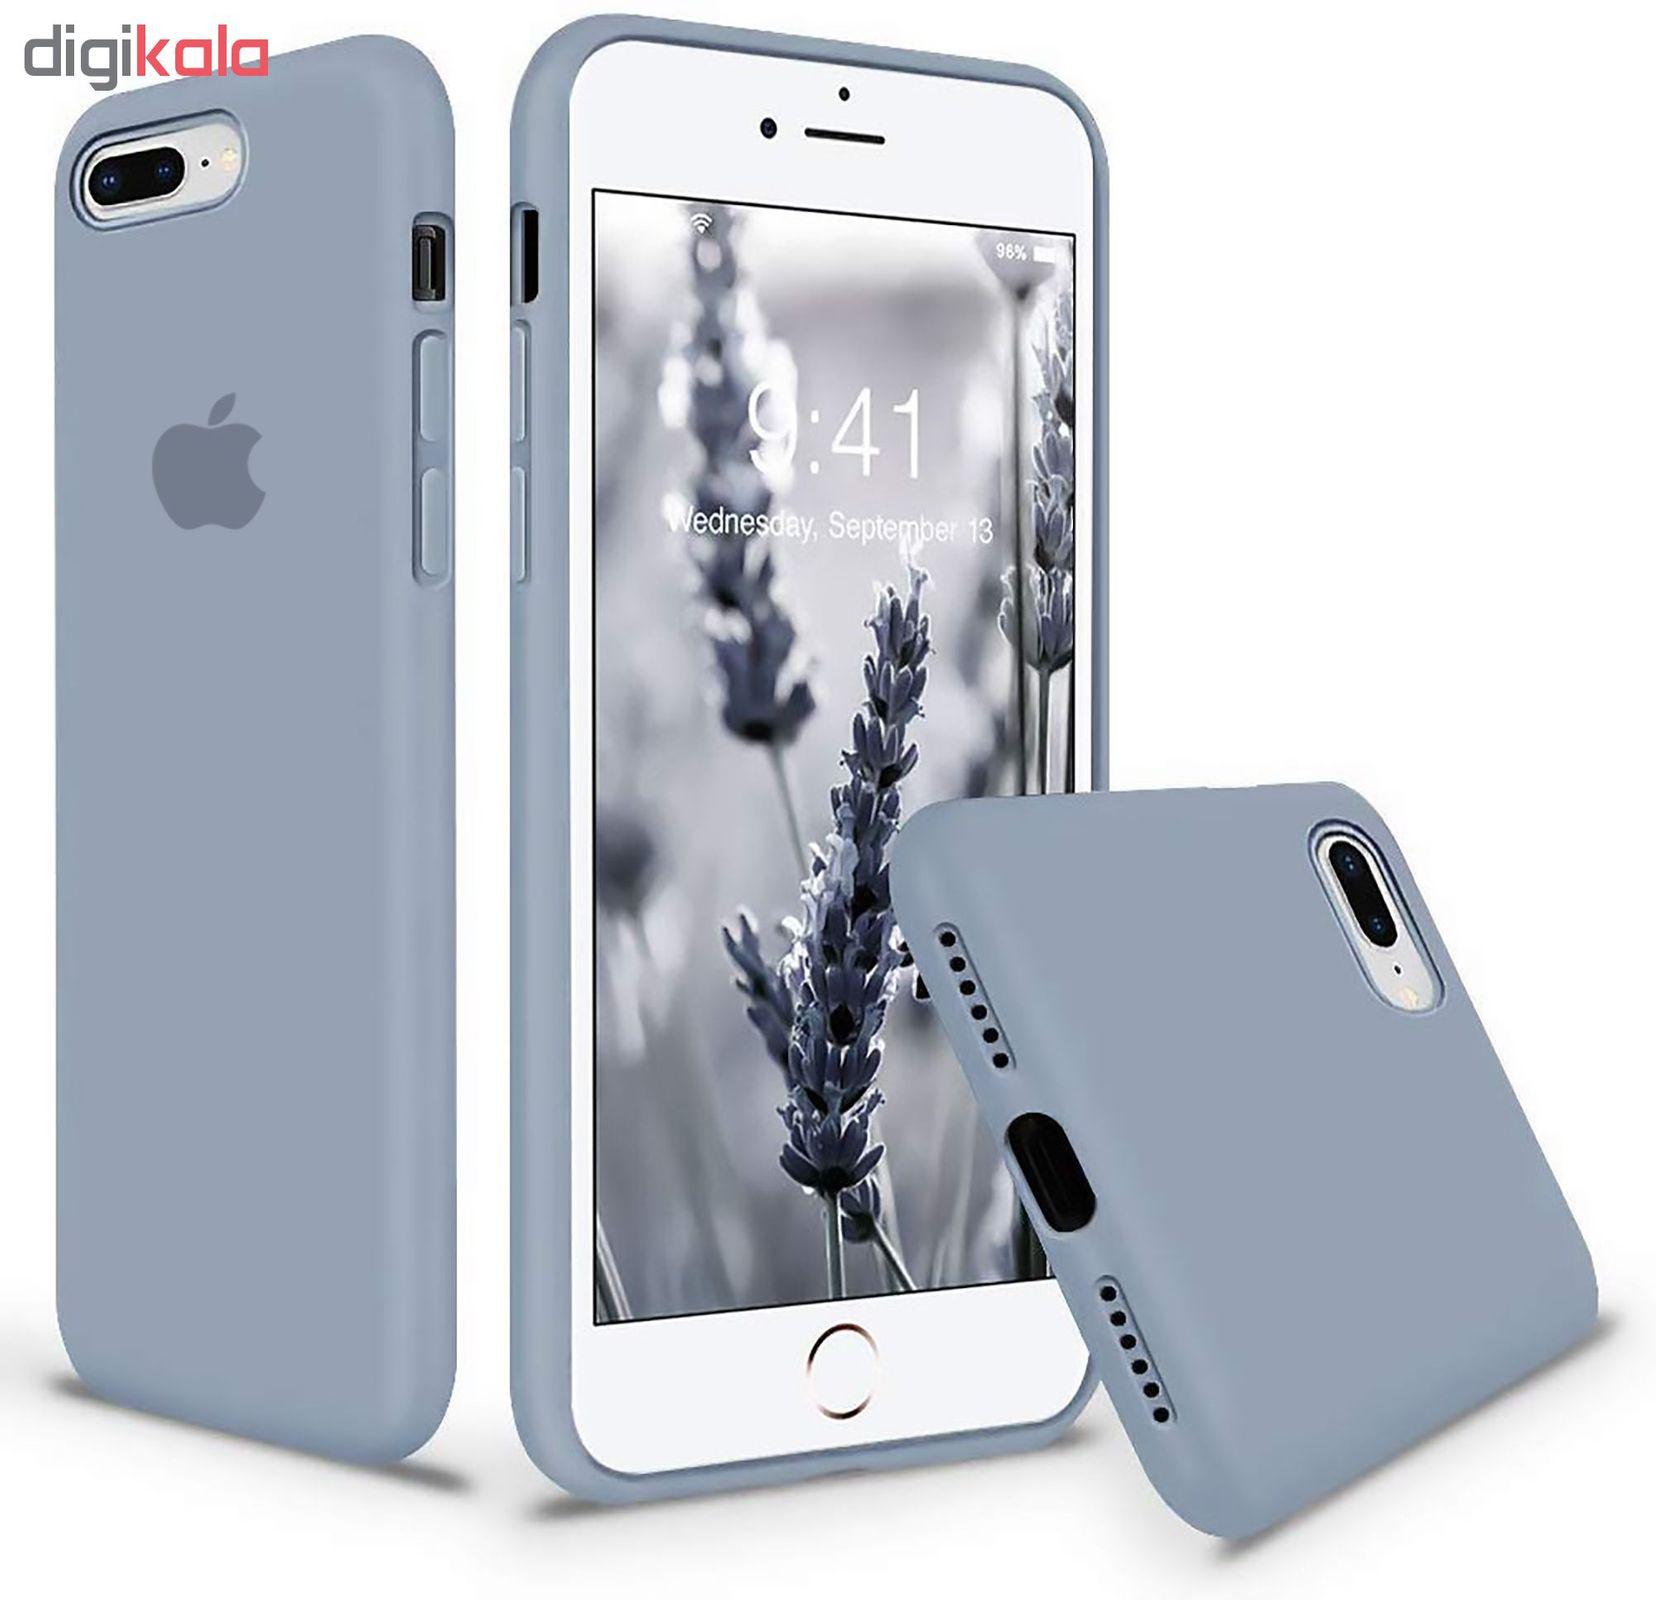 کاور مدل Silc مناسب برای گوشی موبایل اپل  Iphone 8 plus / iphone 7plus main 1 14